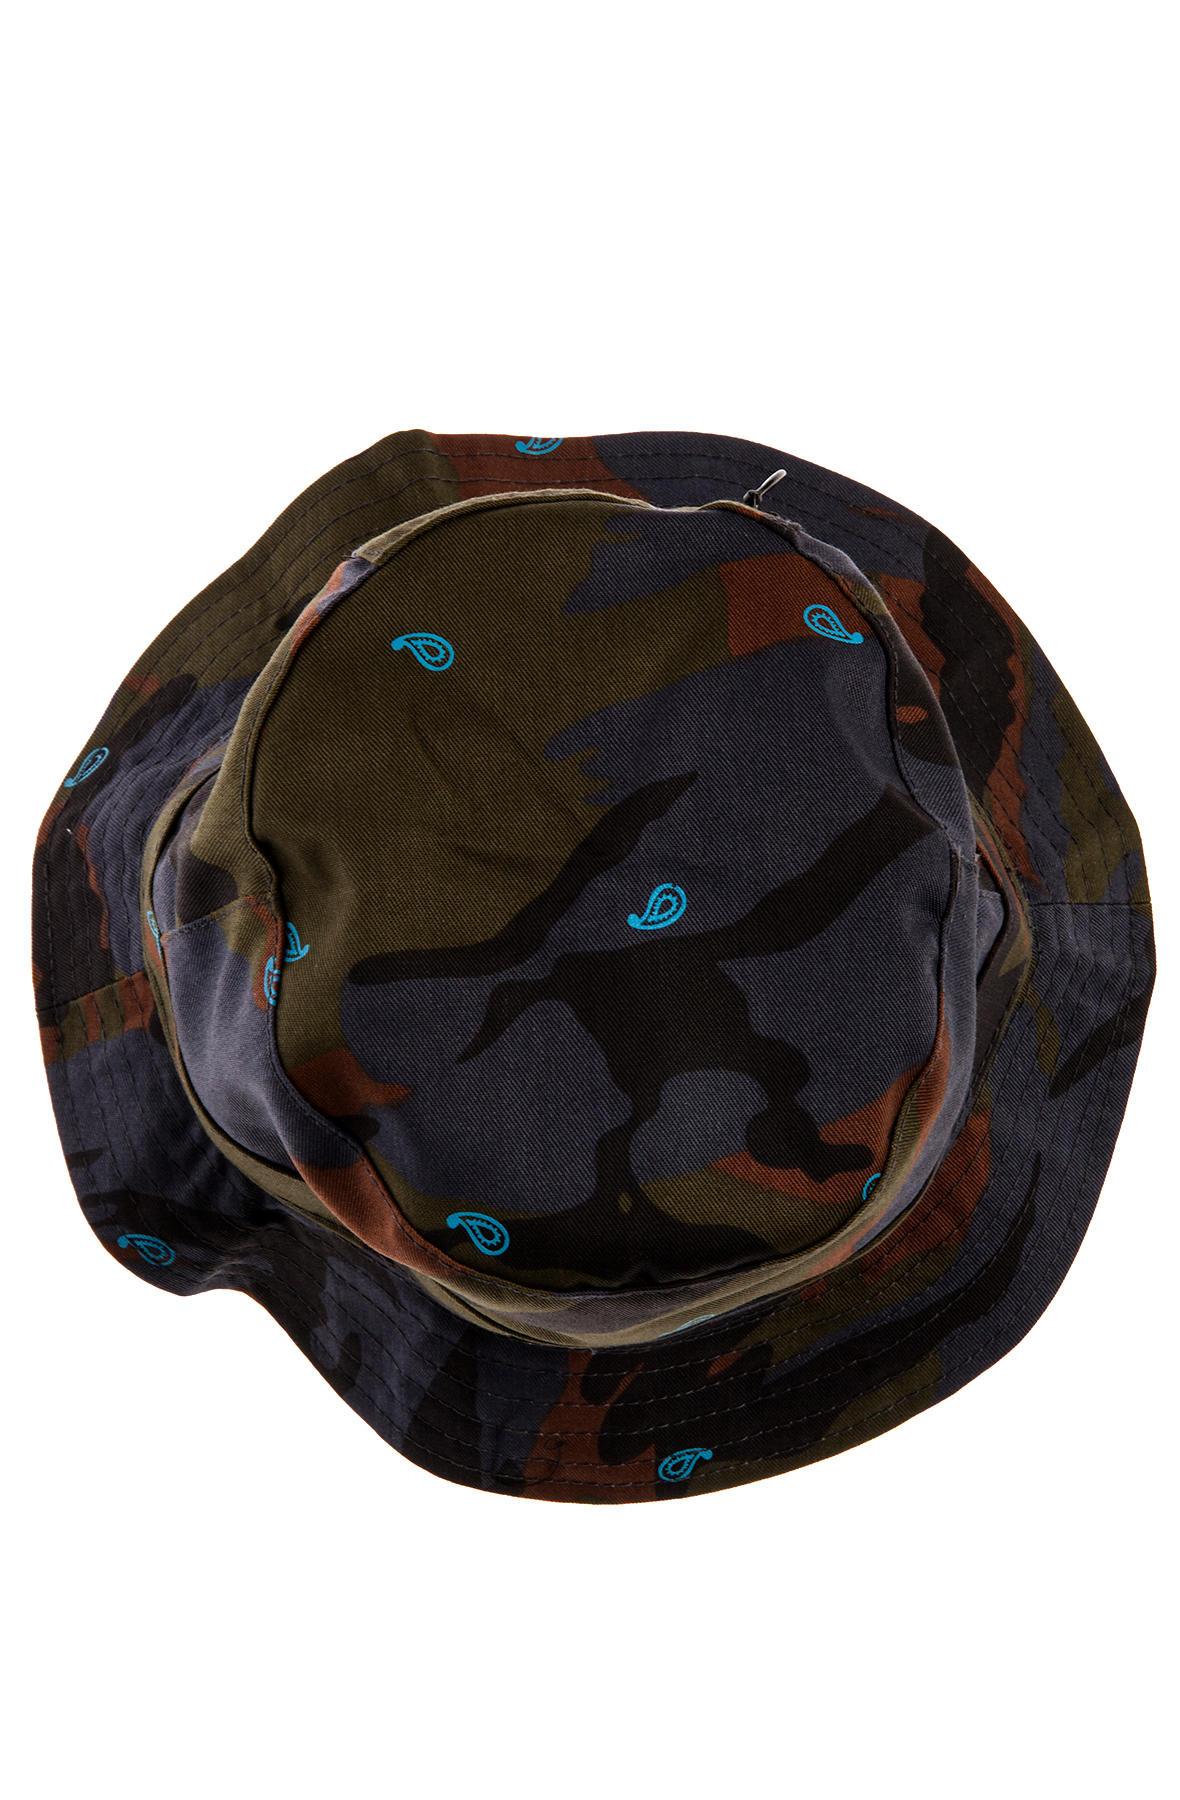 Lyst - Crooks And Castles The Killstreak Bucket Hat in Blue for Men f724ec069147